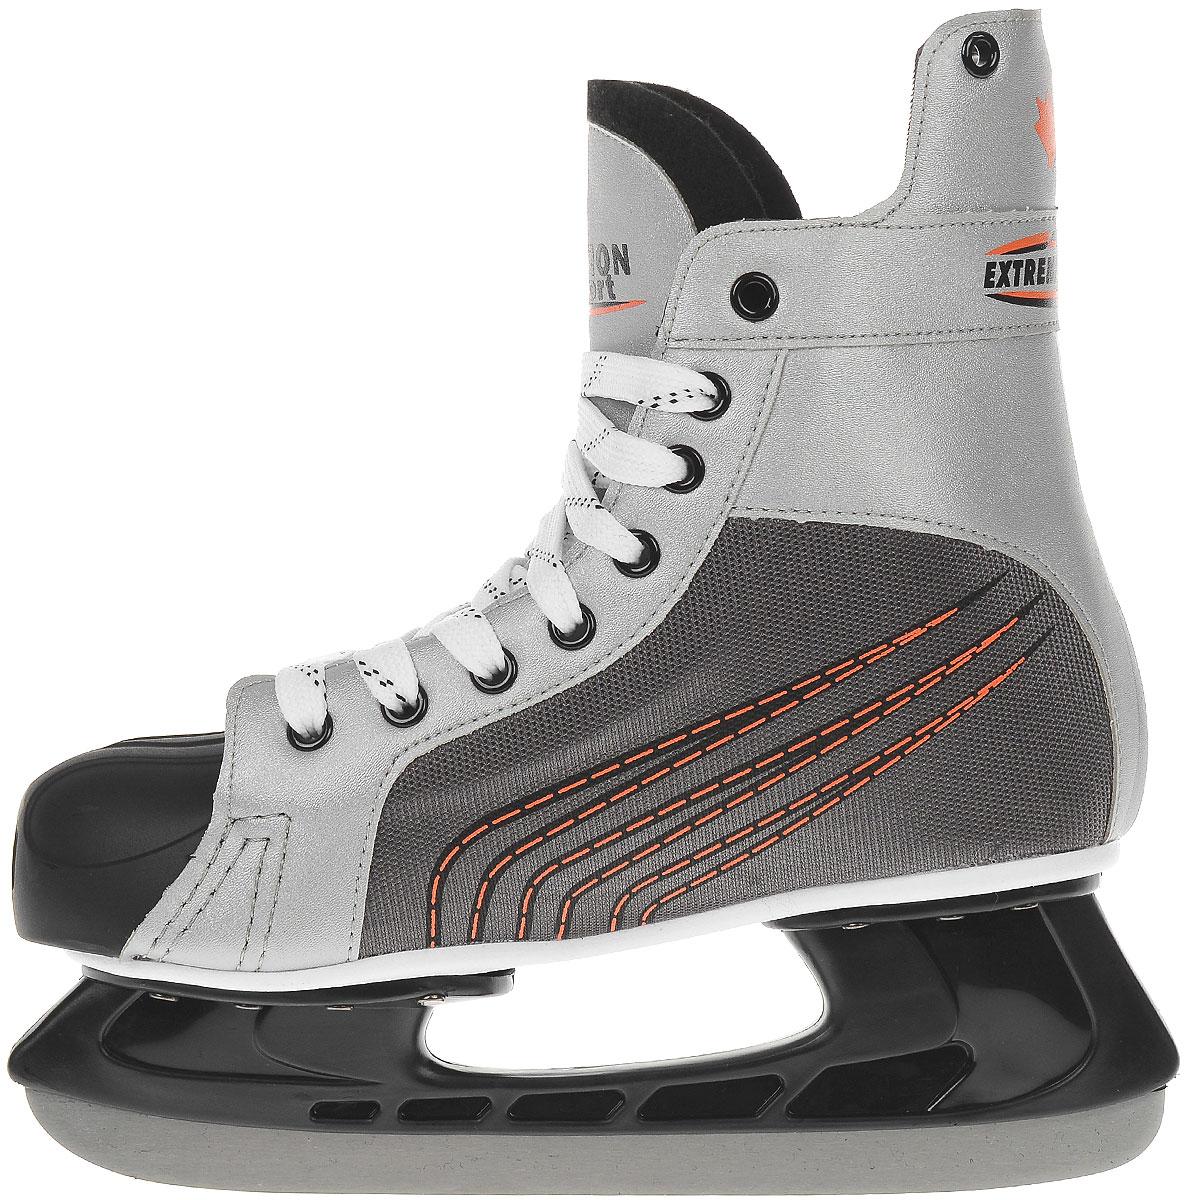 Коньки хоккейные мужские Action, цвет: белый, серый. PW-216N. Размер 40